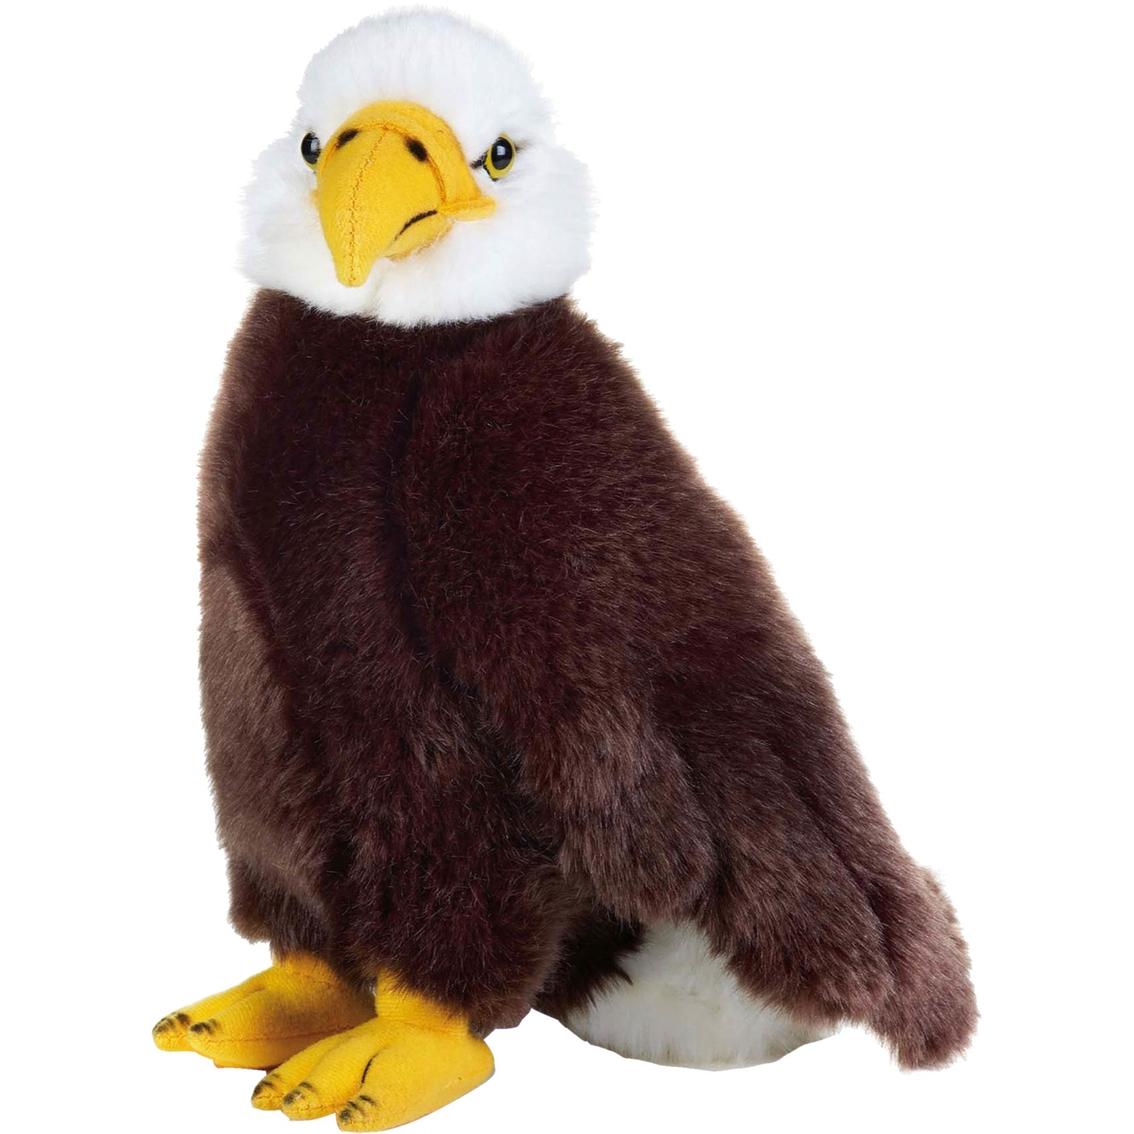 National Geographic Plush Eagle Stuffed Toys Baby Toys Shop